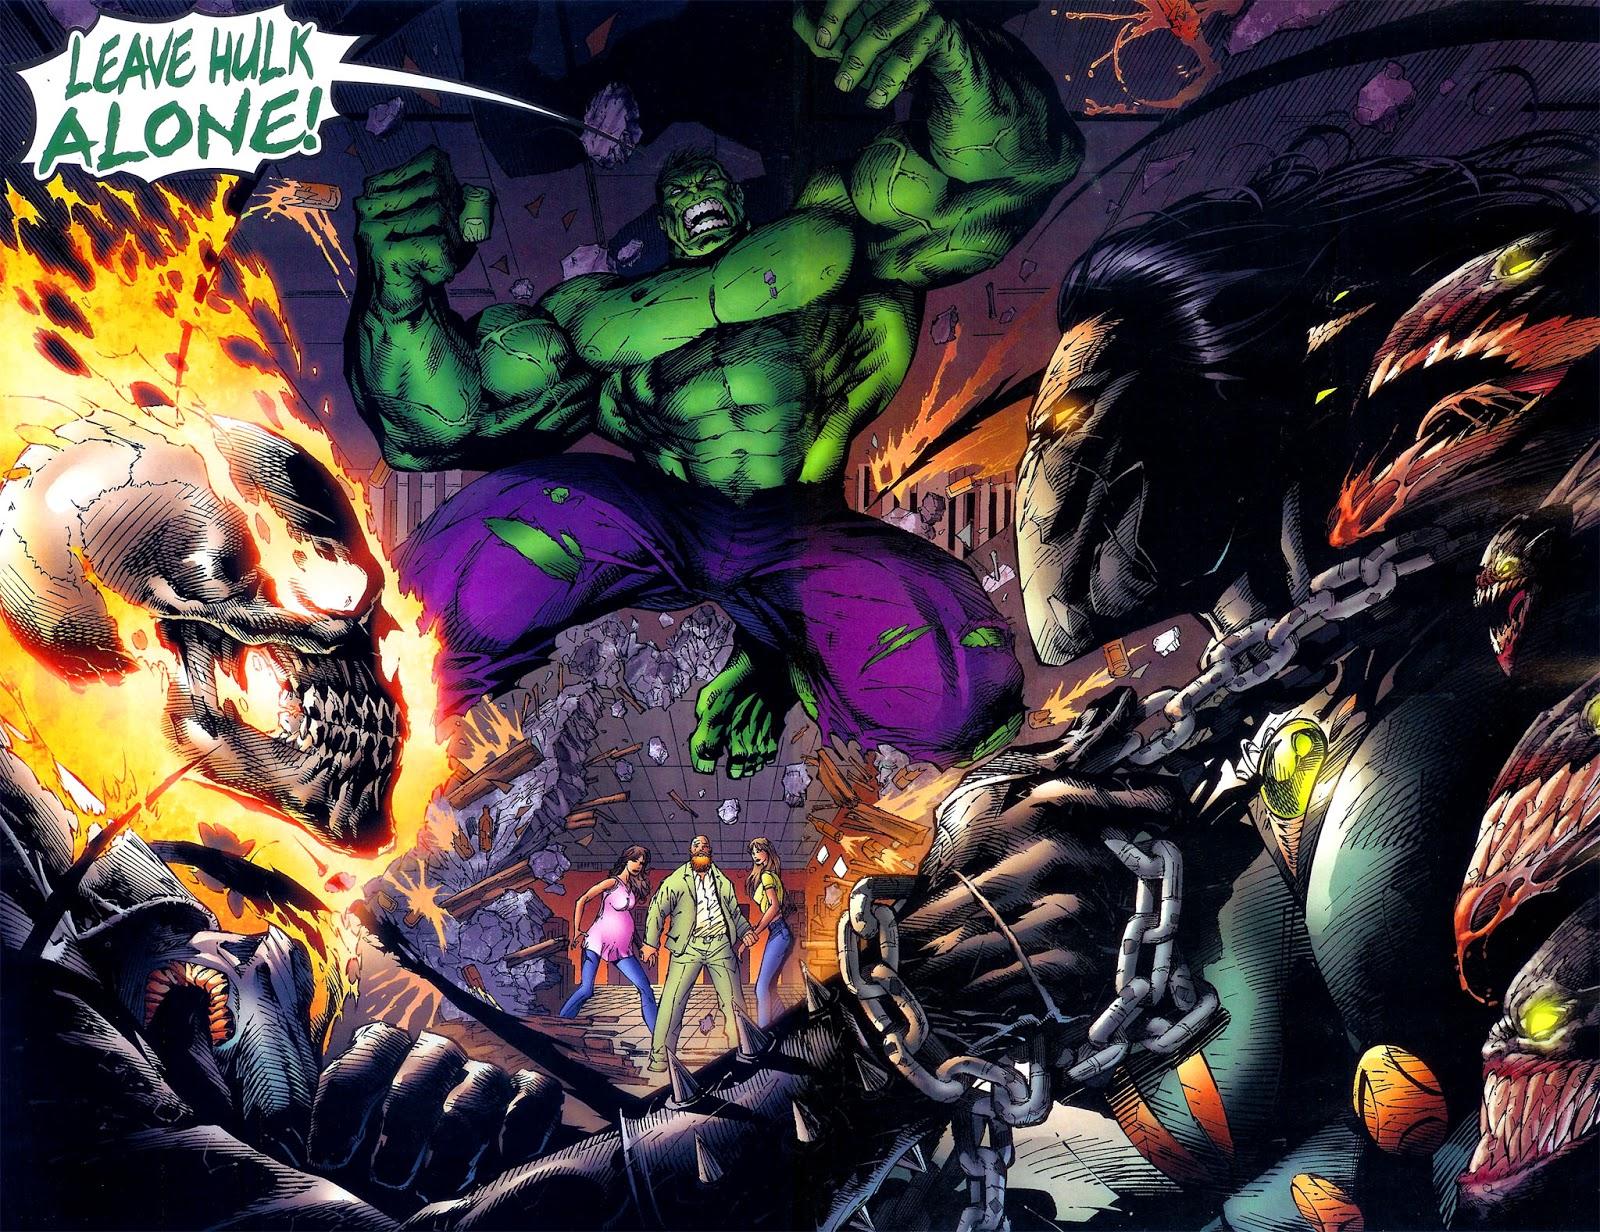 Johnathon Blaze (Earth-7642), Bruce Banner (Earth-7642), Sara Pezzini (Earth-7642), Franchetti Mafia (Earth-7642), and Danielle Baptiste (Earth-7642) from Darkness Incredible Hulk Vol 1 1 001.jpg